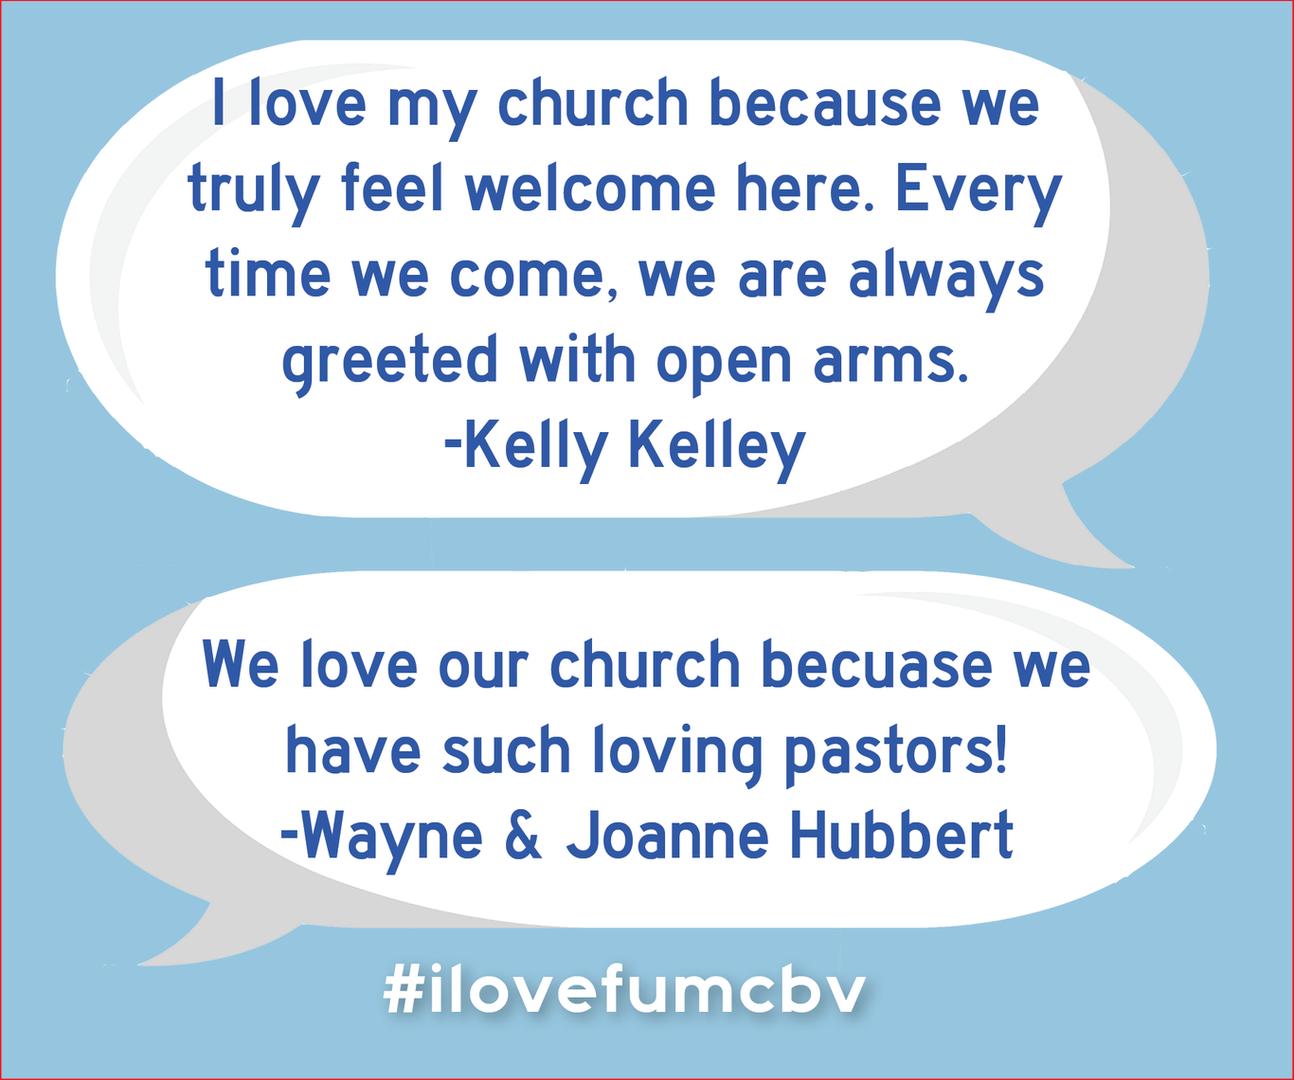 #fumcbv sharing post2.png